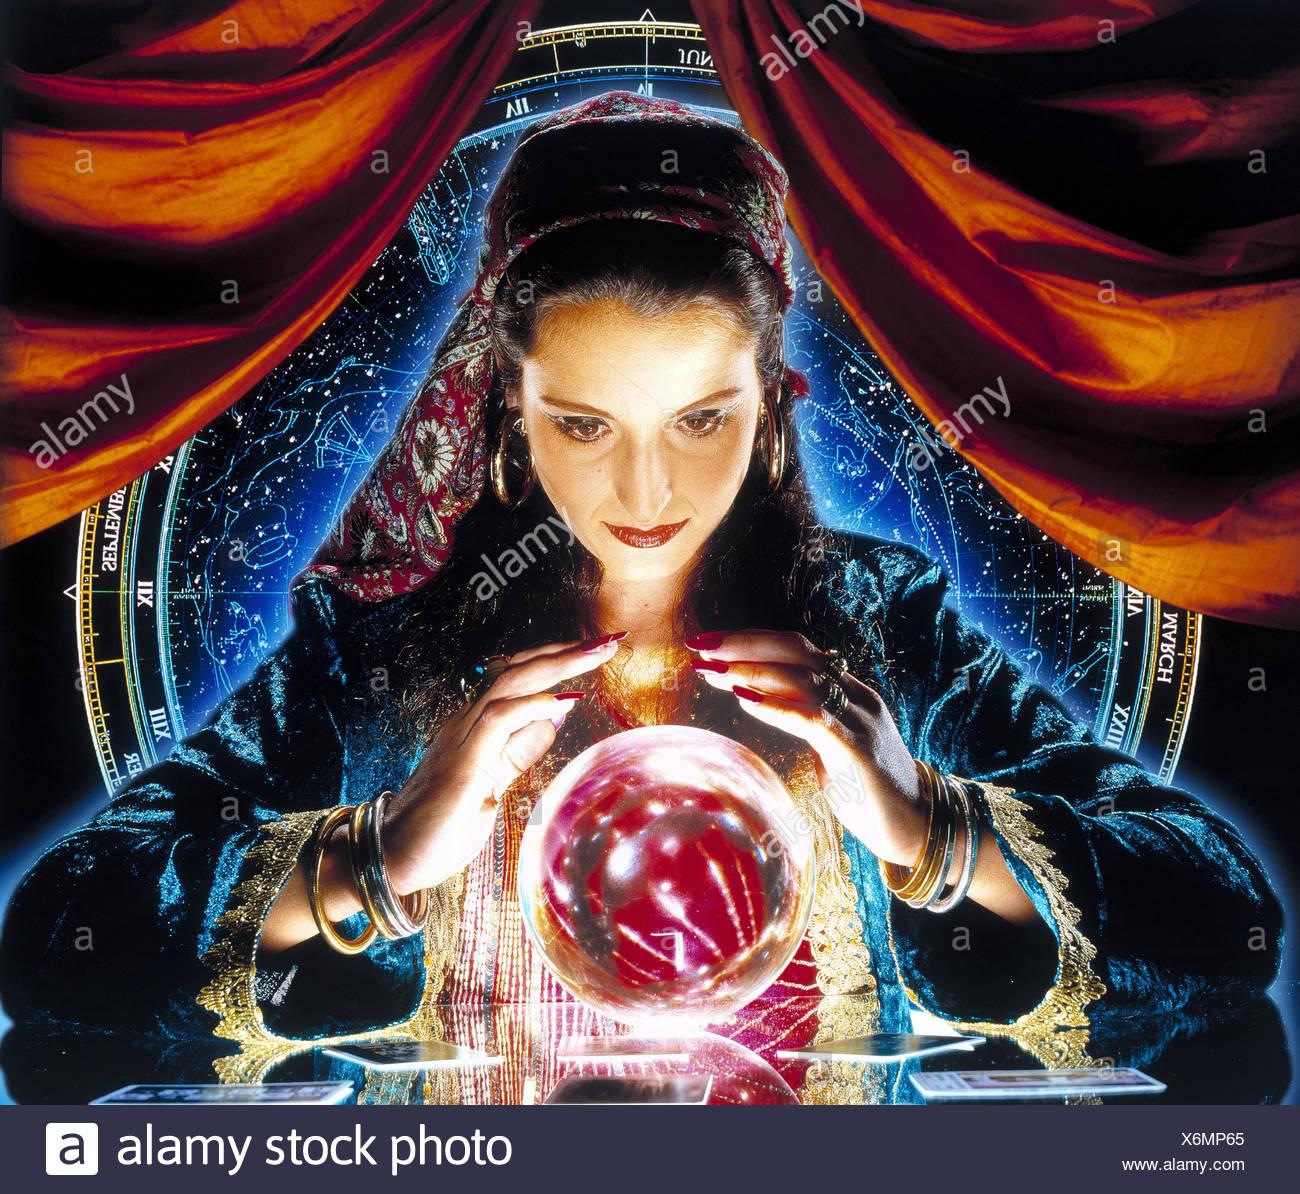 Foreteller, crystal ball, woman, glass ball, clairvoyant